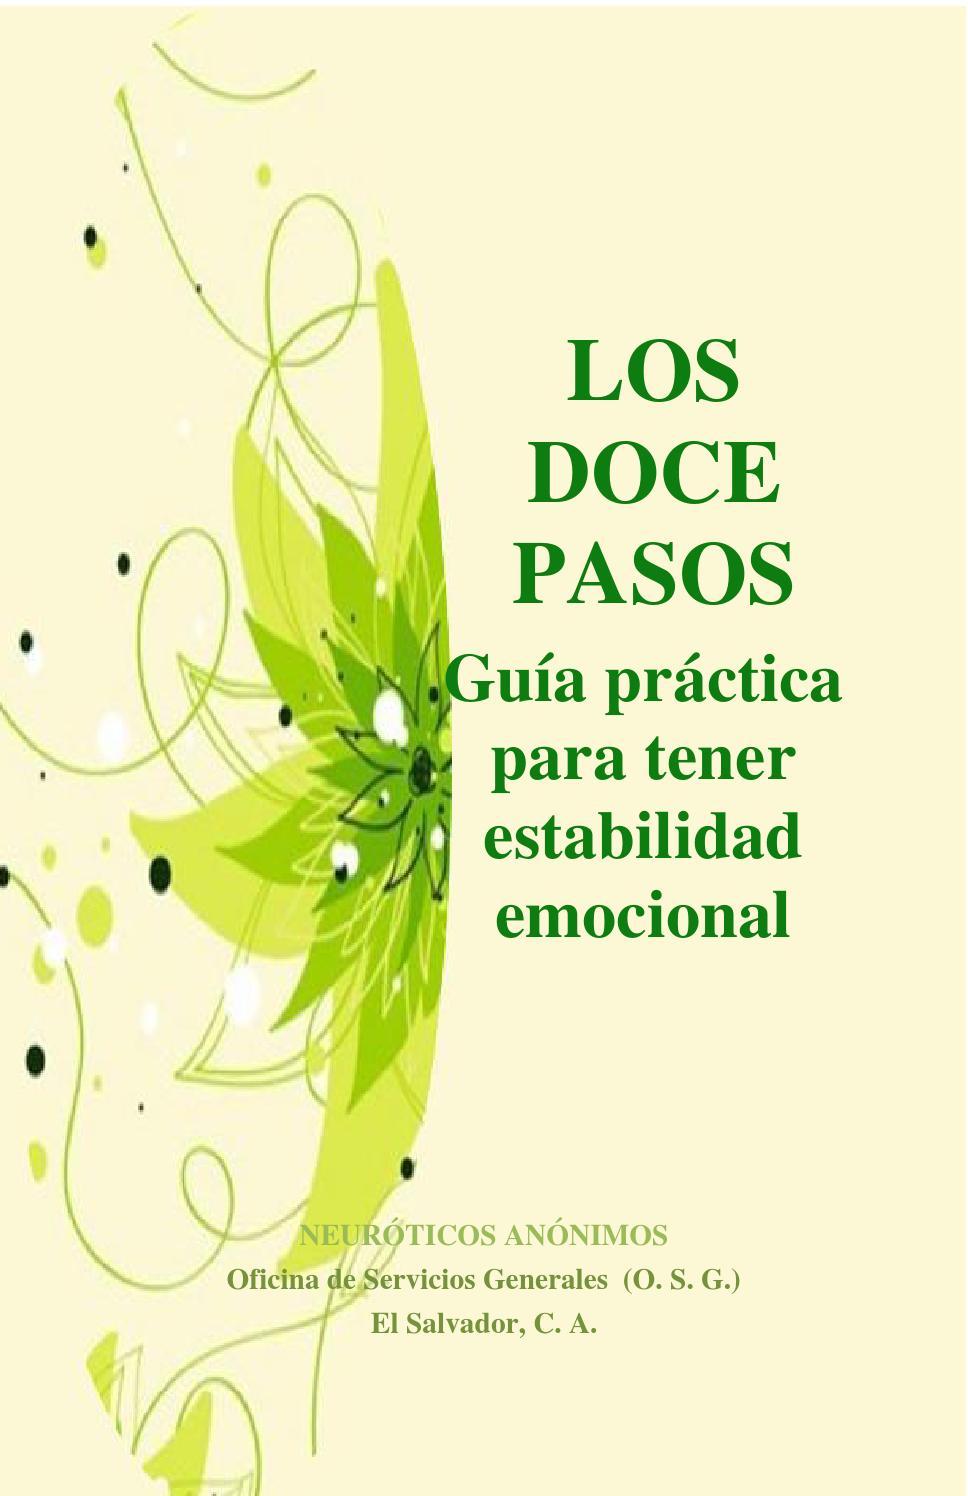 Los Doce Pasos de Neuróticos Anónimos by Neuróticos Anónimos_sv - issuu